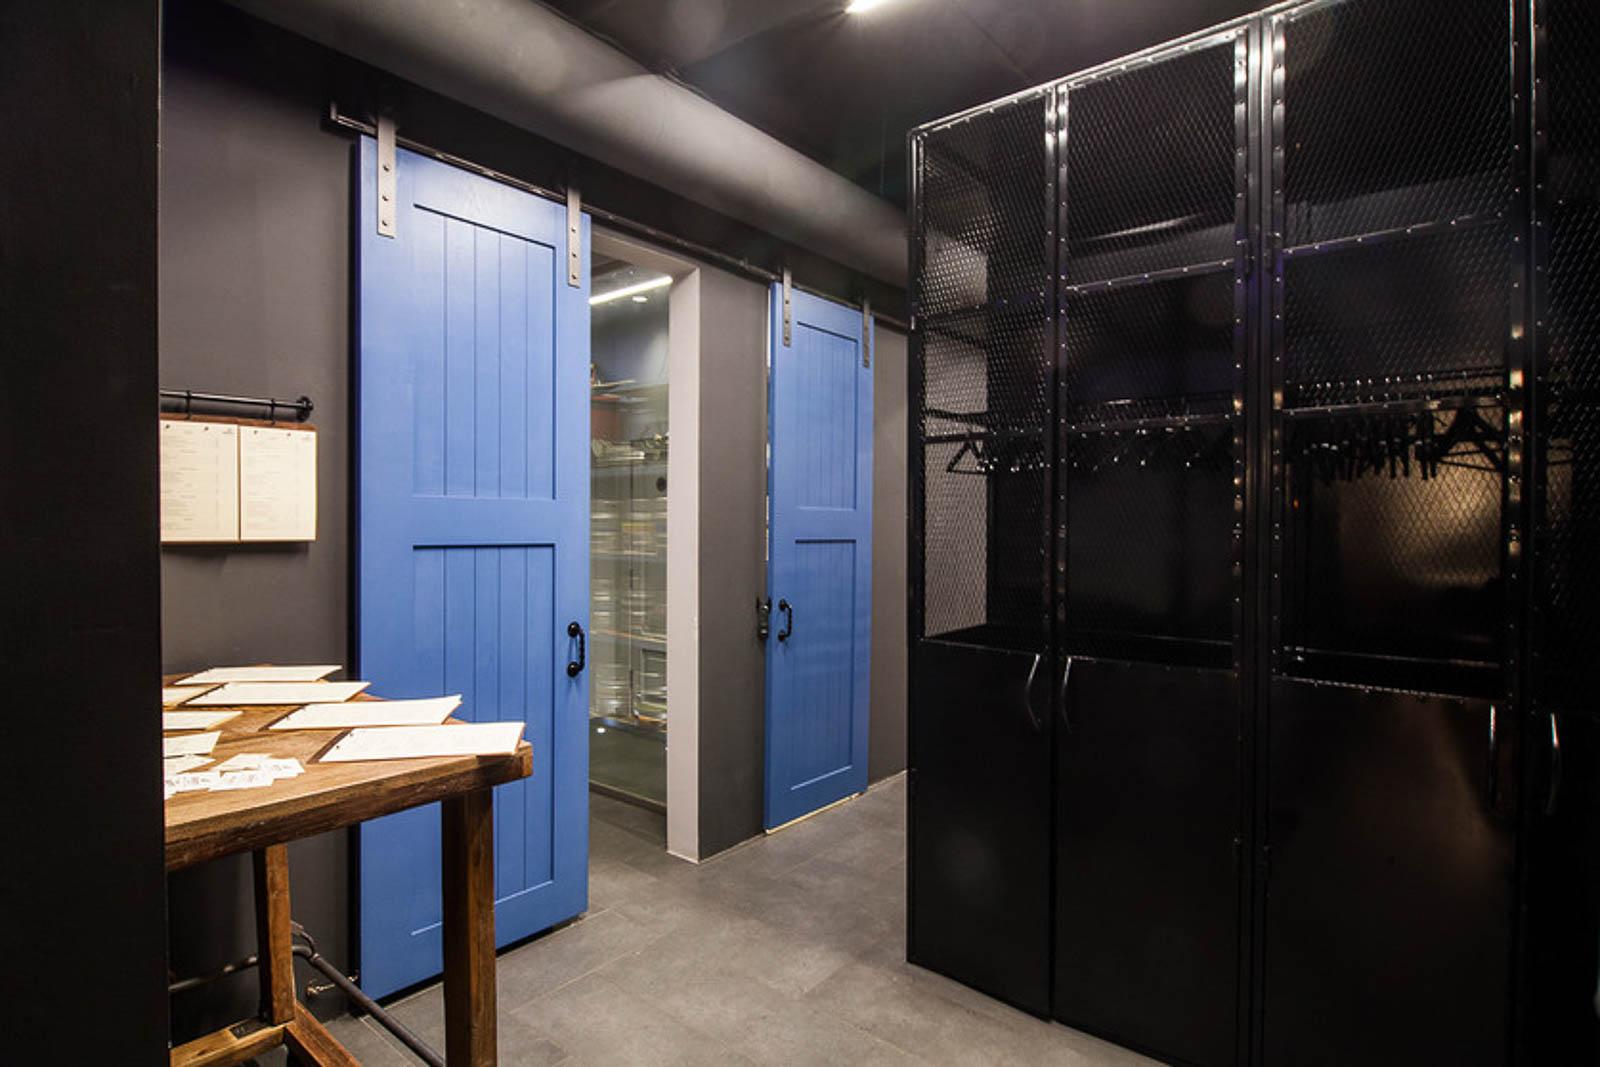 Doors to the barrel room and bathrooms